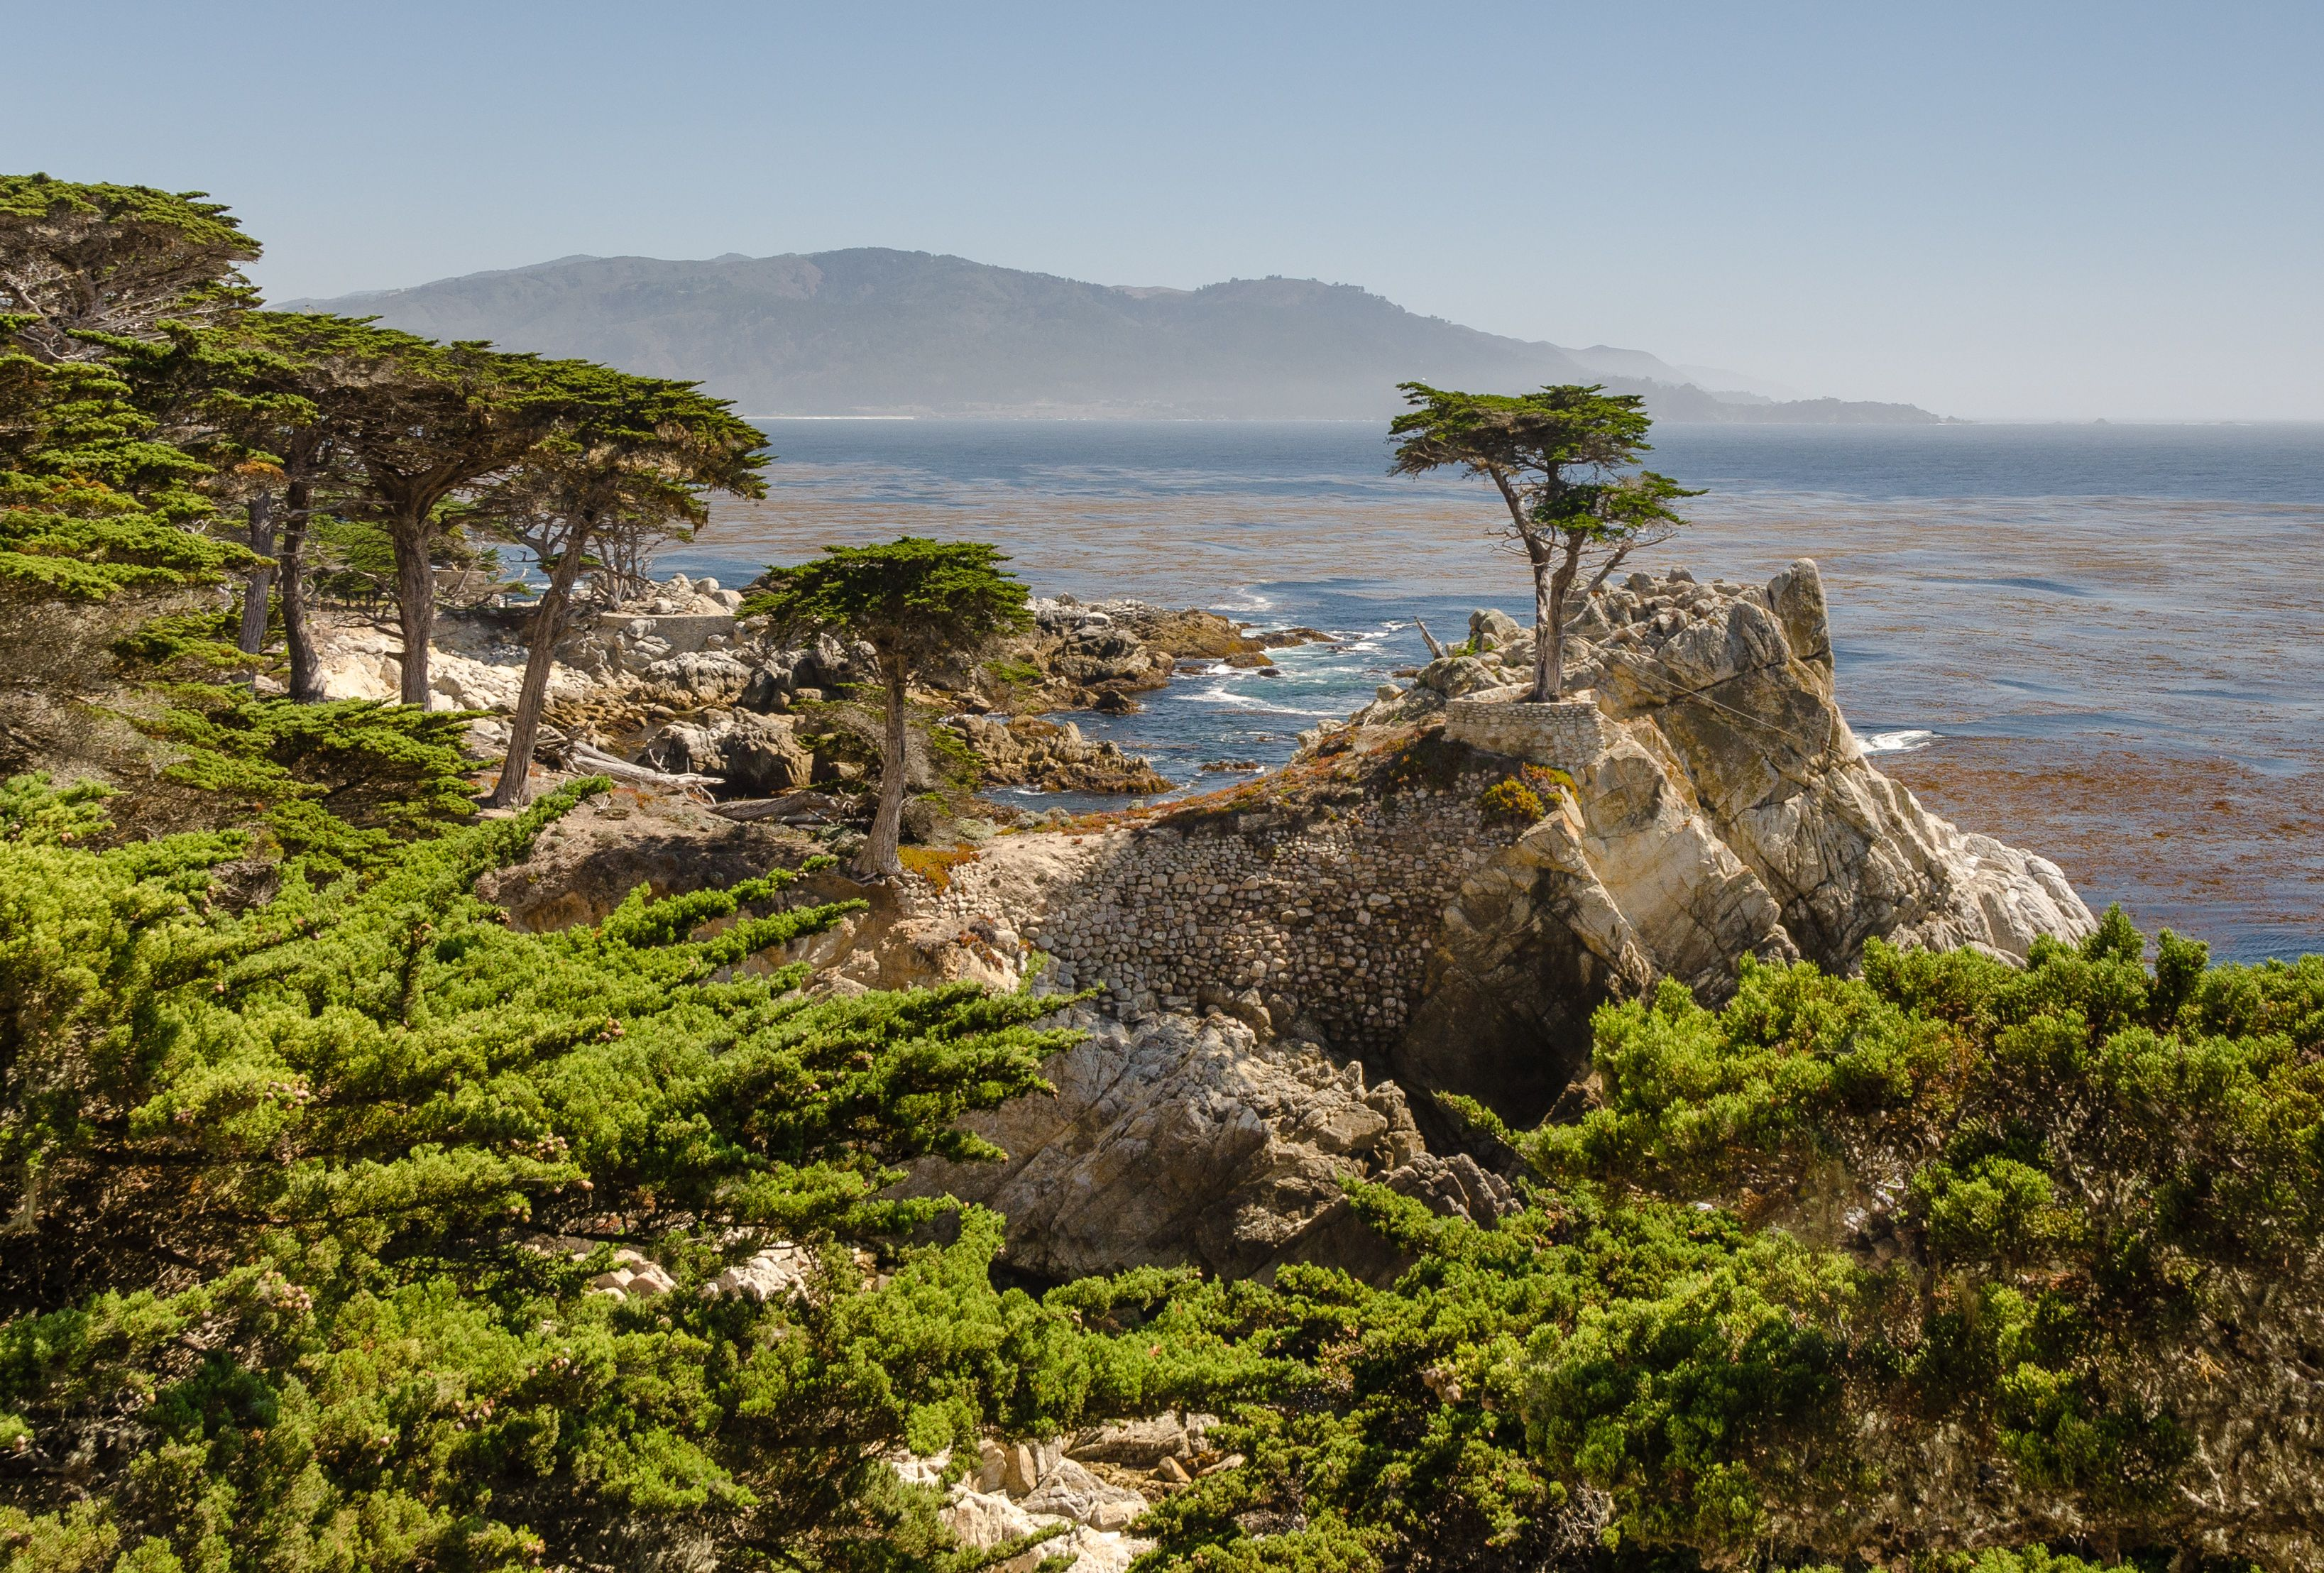 Monterey Cypress Near The Kelp Forests By Tuxyso 3274 2216 Road Trip Fun Road Trip Usa California Coast